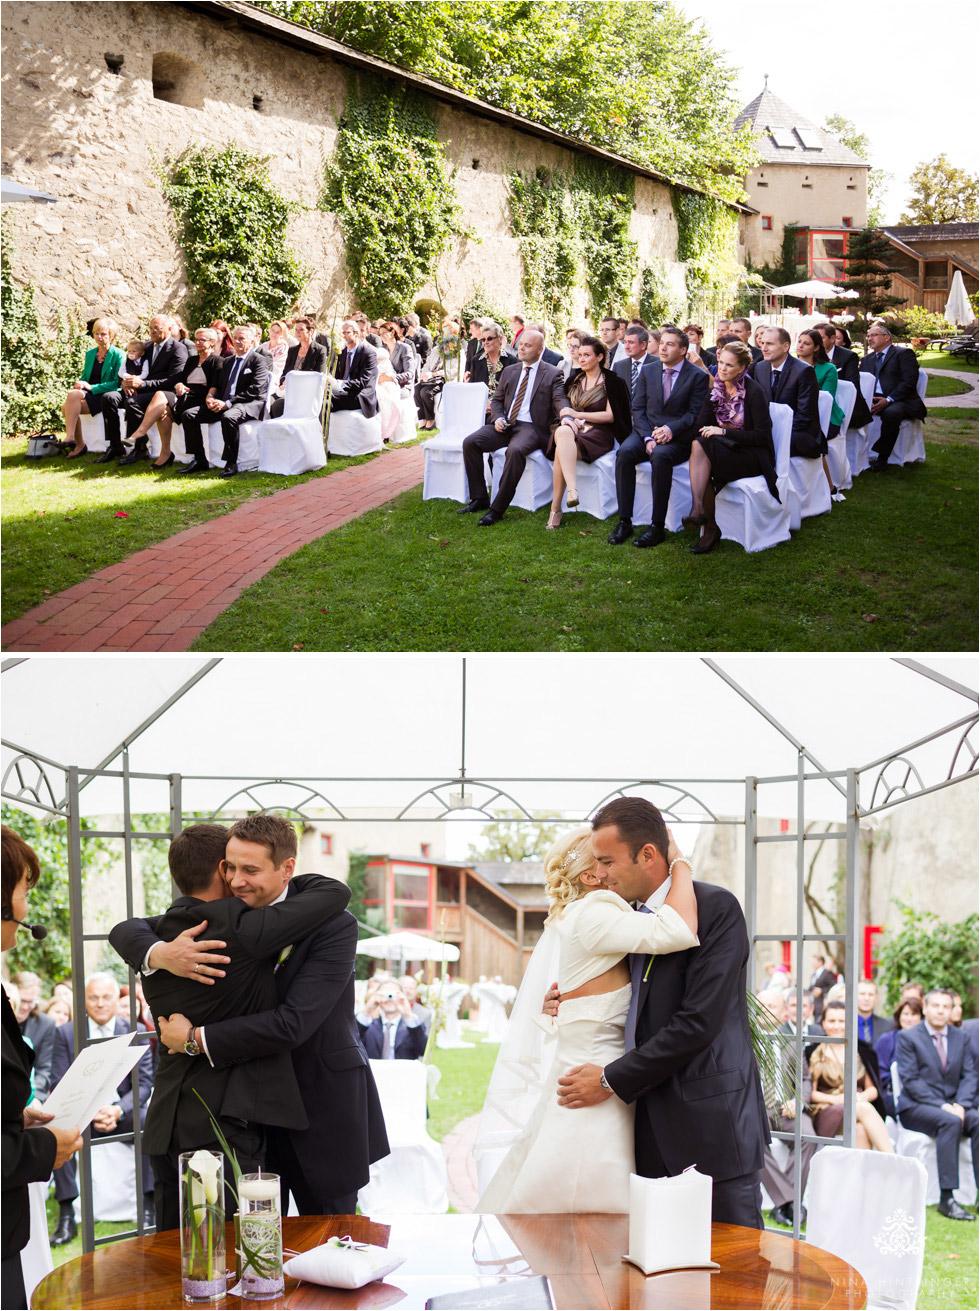 Beautiful and emotional wedding at Schloss Gabelhofen | Fohnsdorf, Styria - Blog of Nina Hintringer Photography - Wedding Photography, Wedding Reportage and Destination Weddings